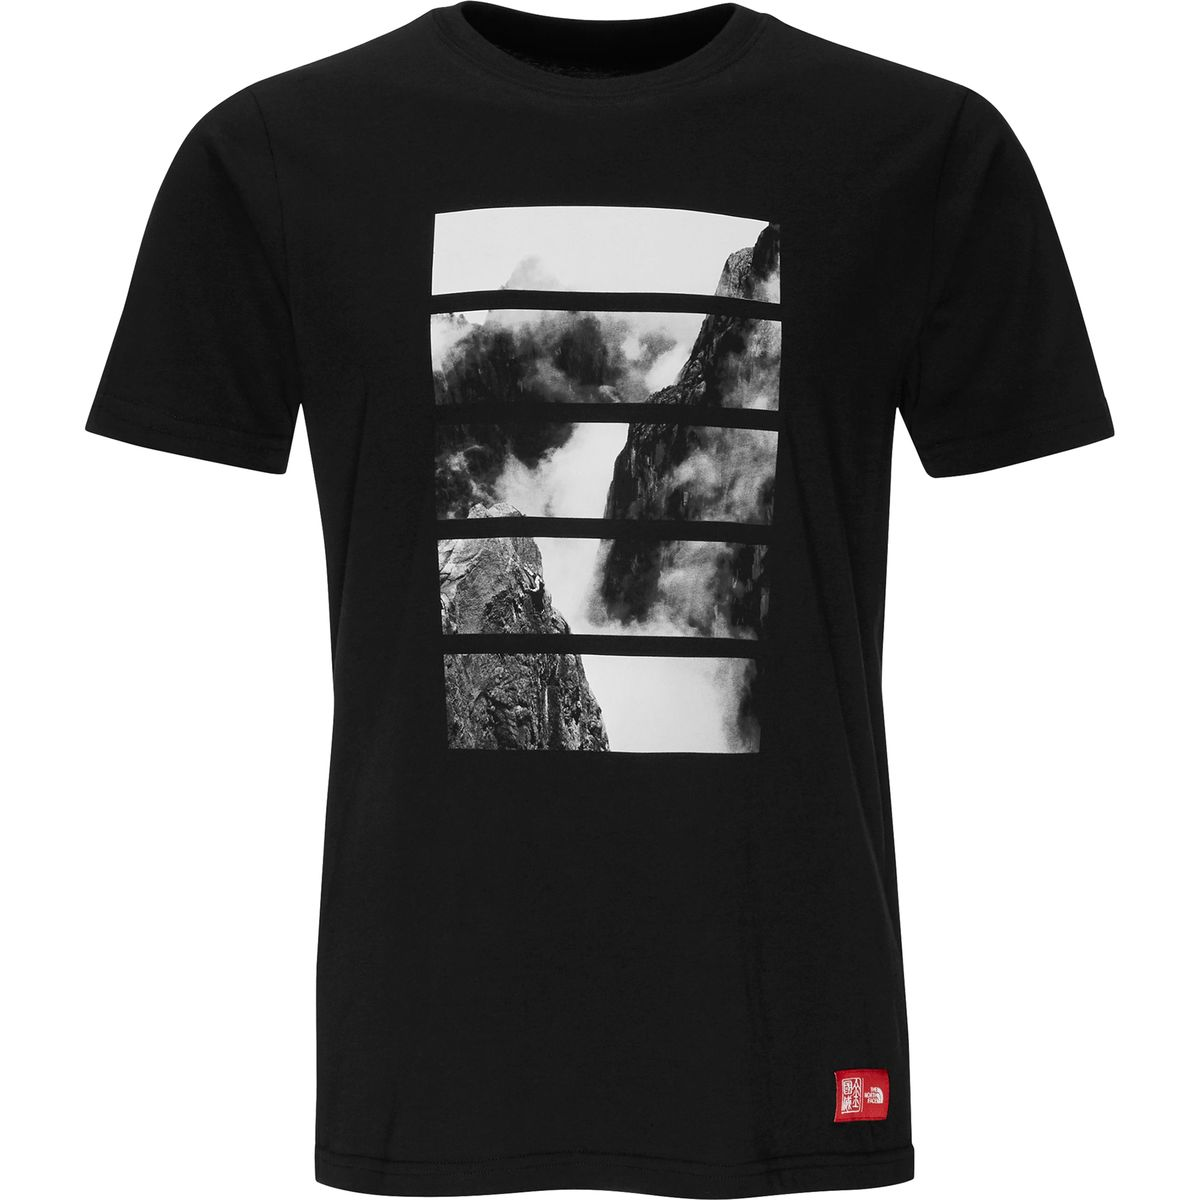 The North Face Jimmy Chin Short-Sleeve T-Shirt - Men